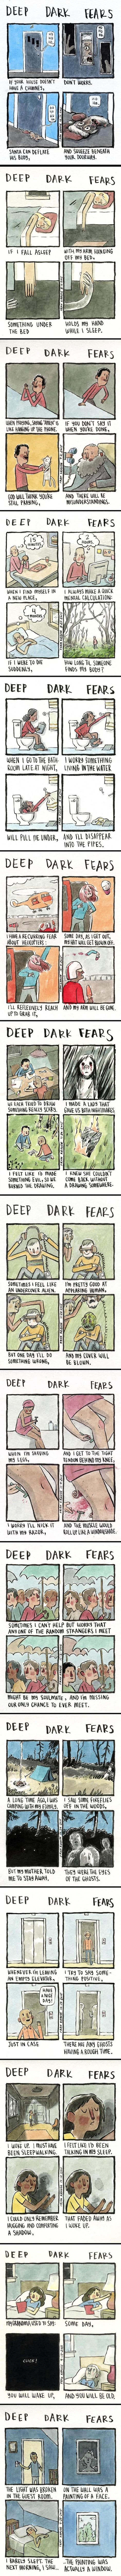 Our Deep Dark Fears As Comic Strips - Part One